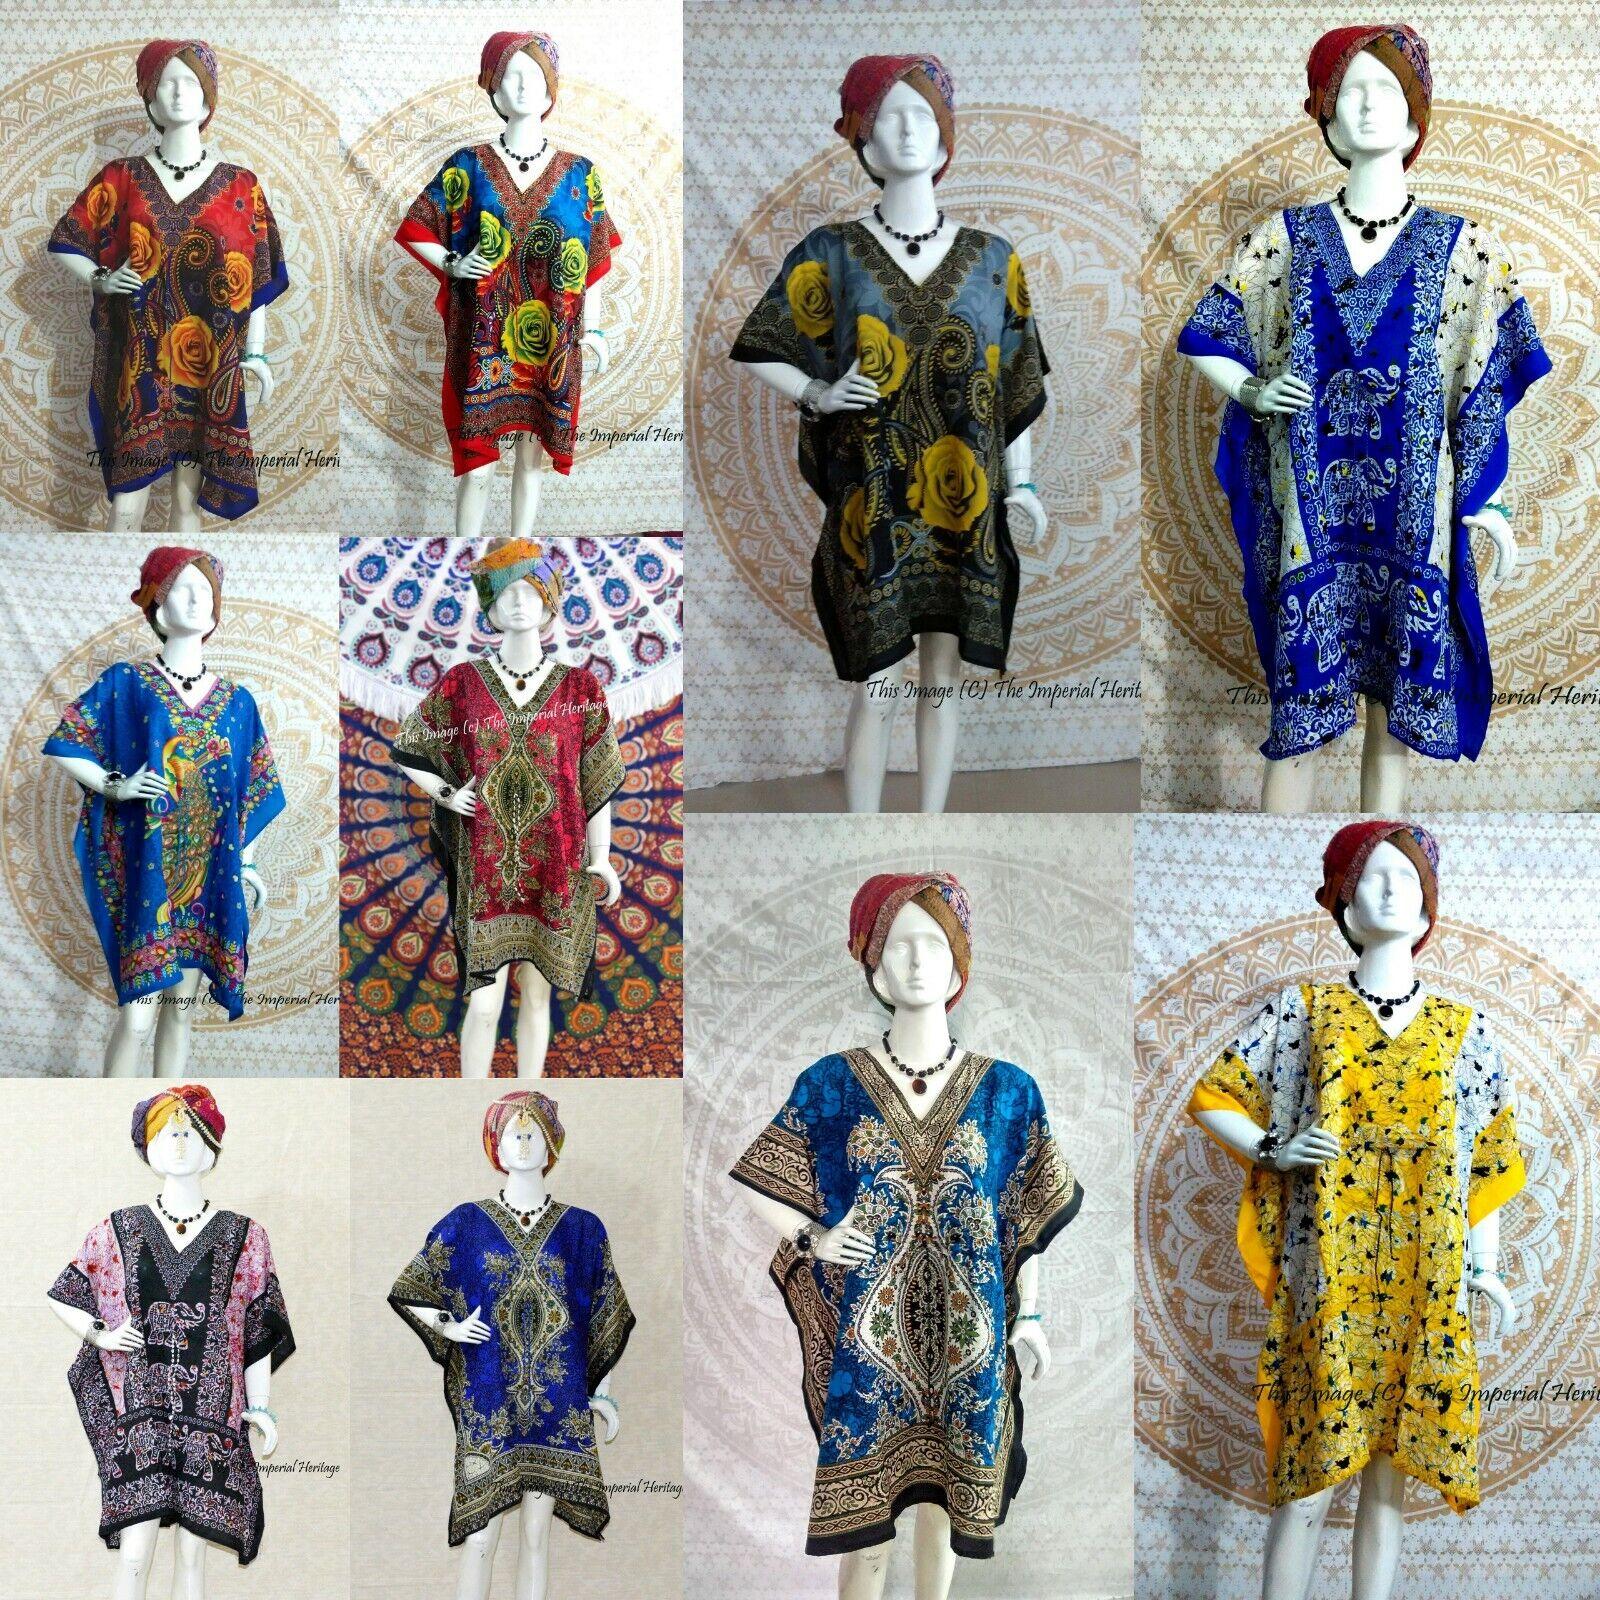 30182e0656c26 Pcs Wholesale Lot New Tunic African Short Assorted Women's-Dress ...